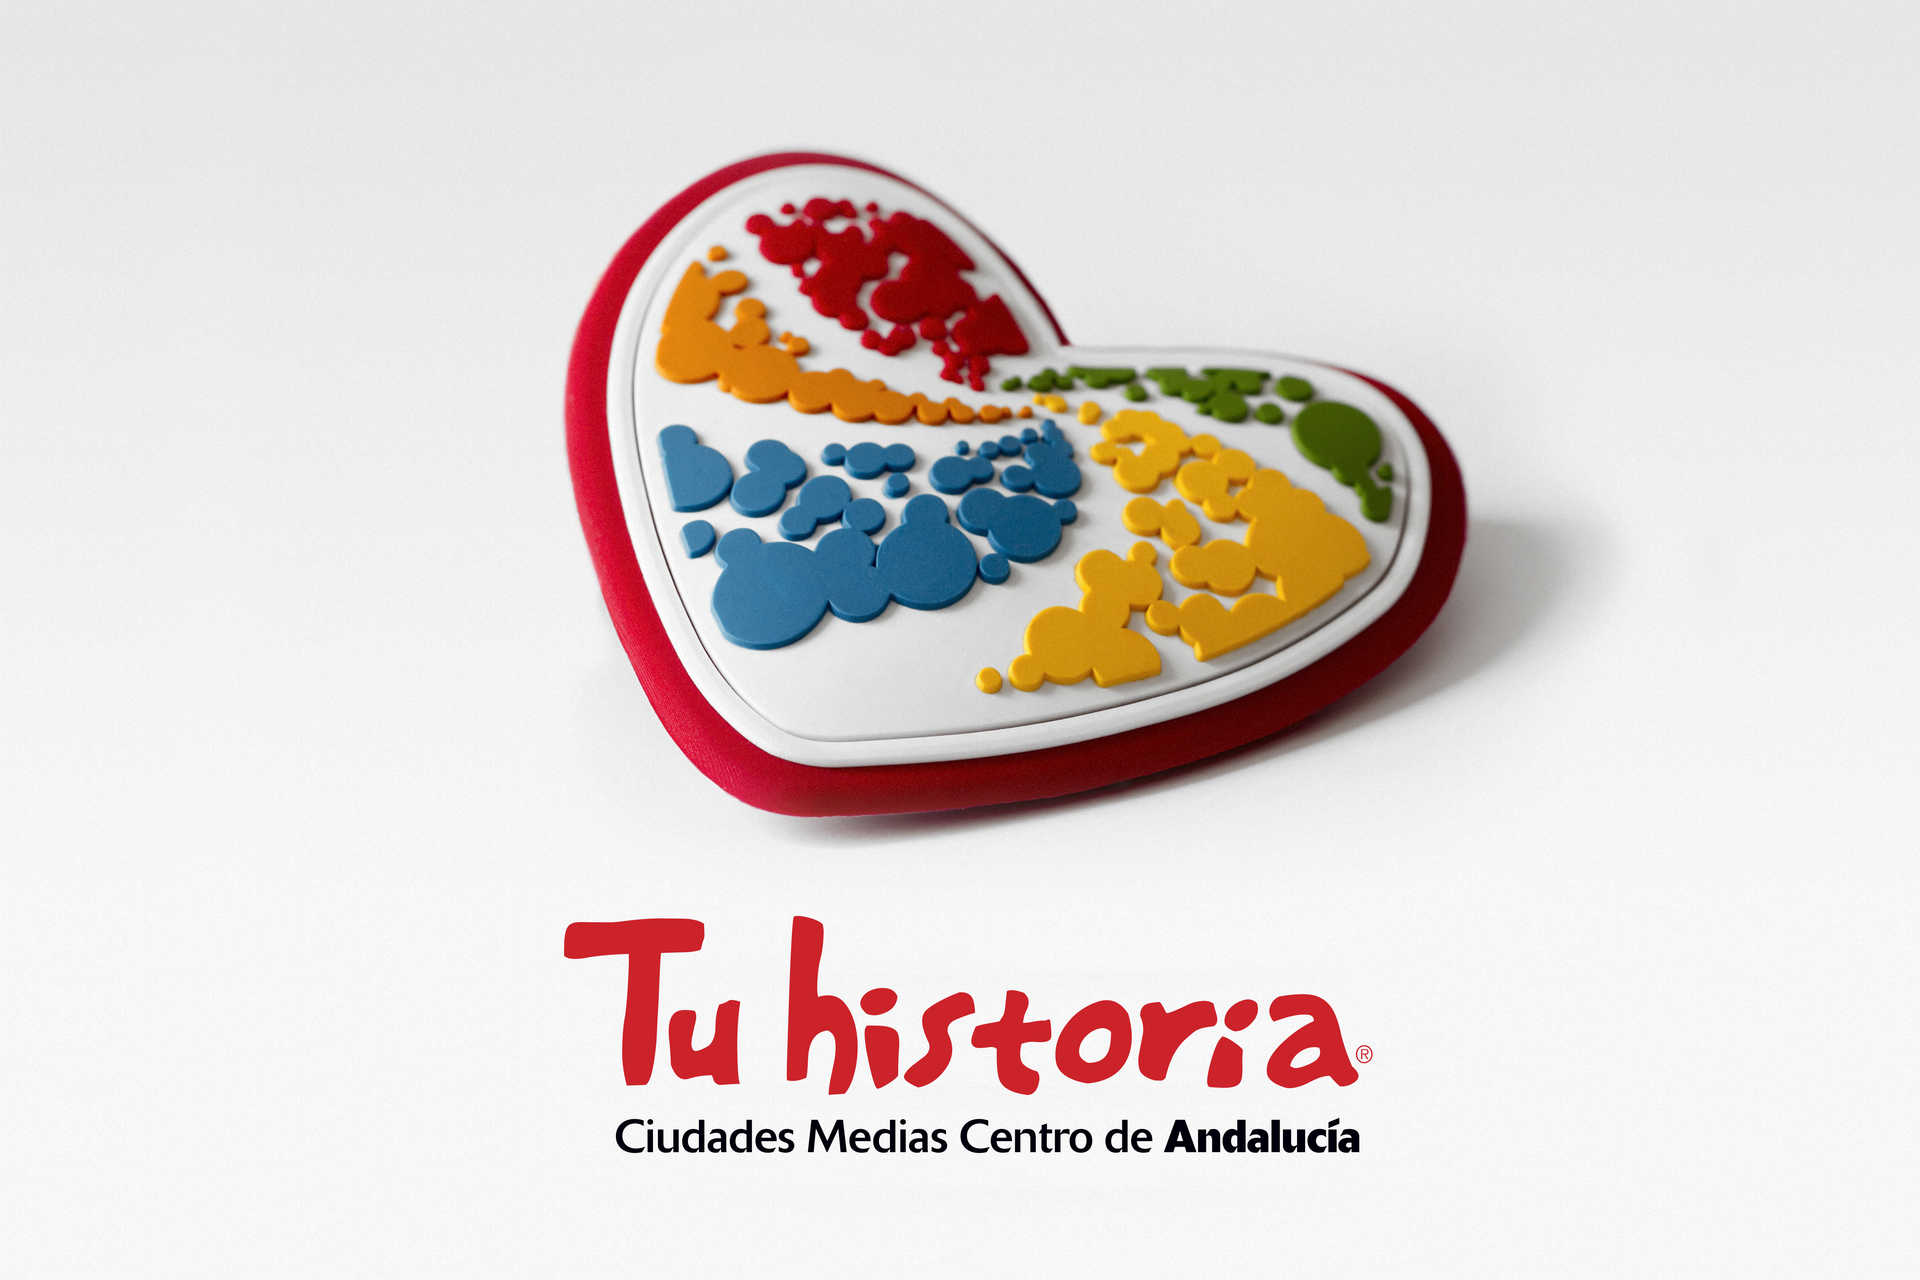 Donde late la historia de Andalucía